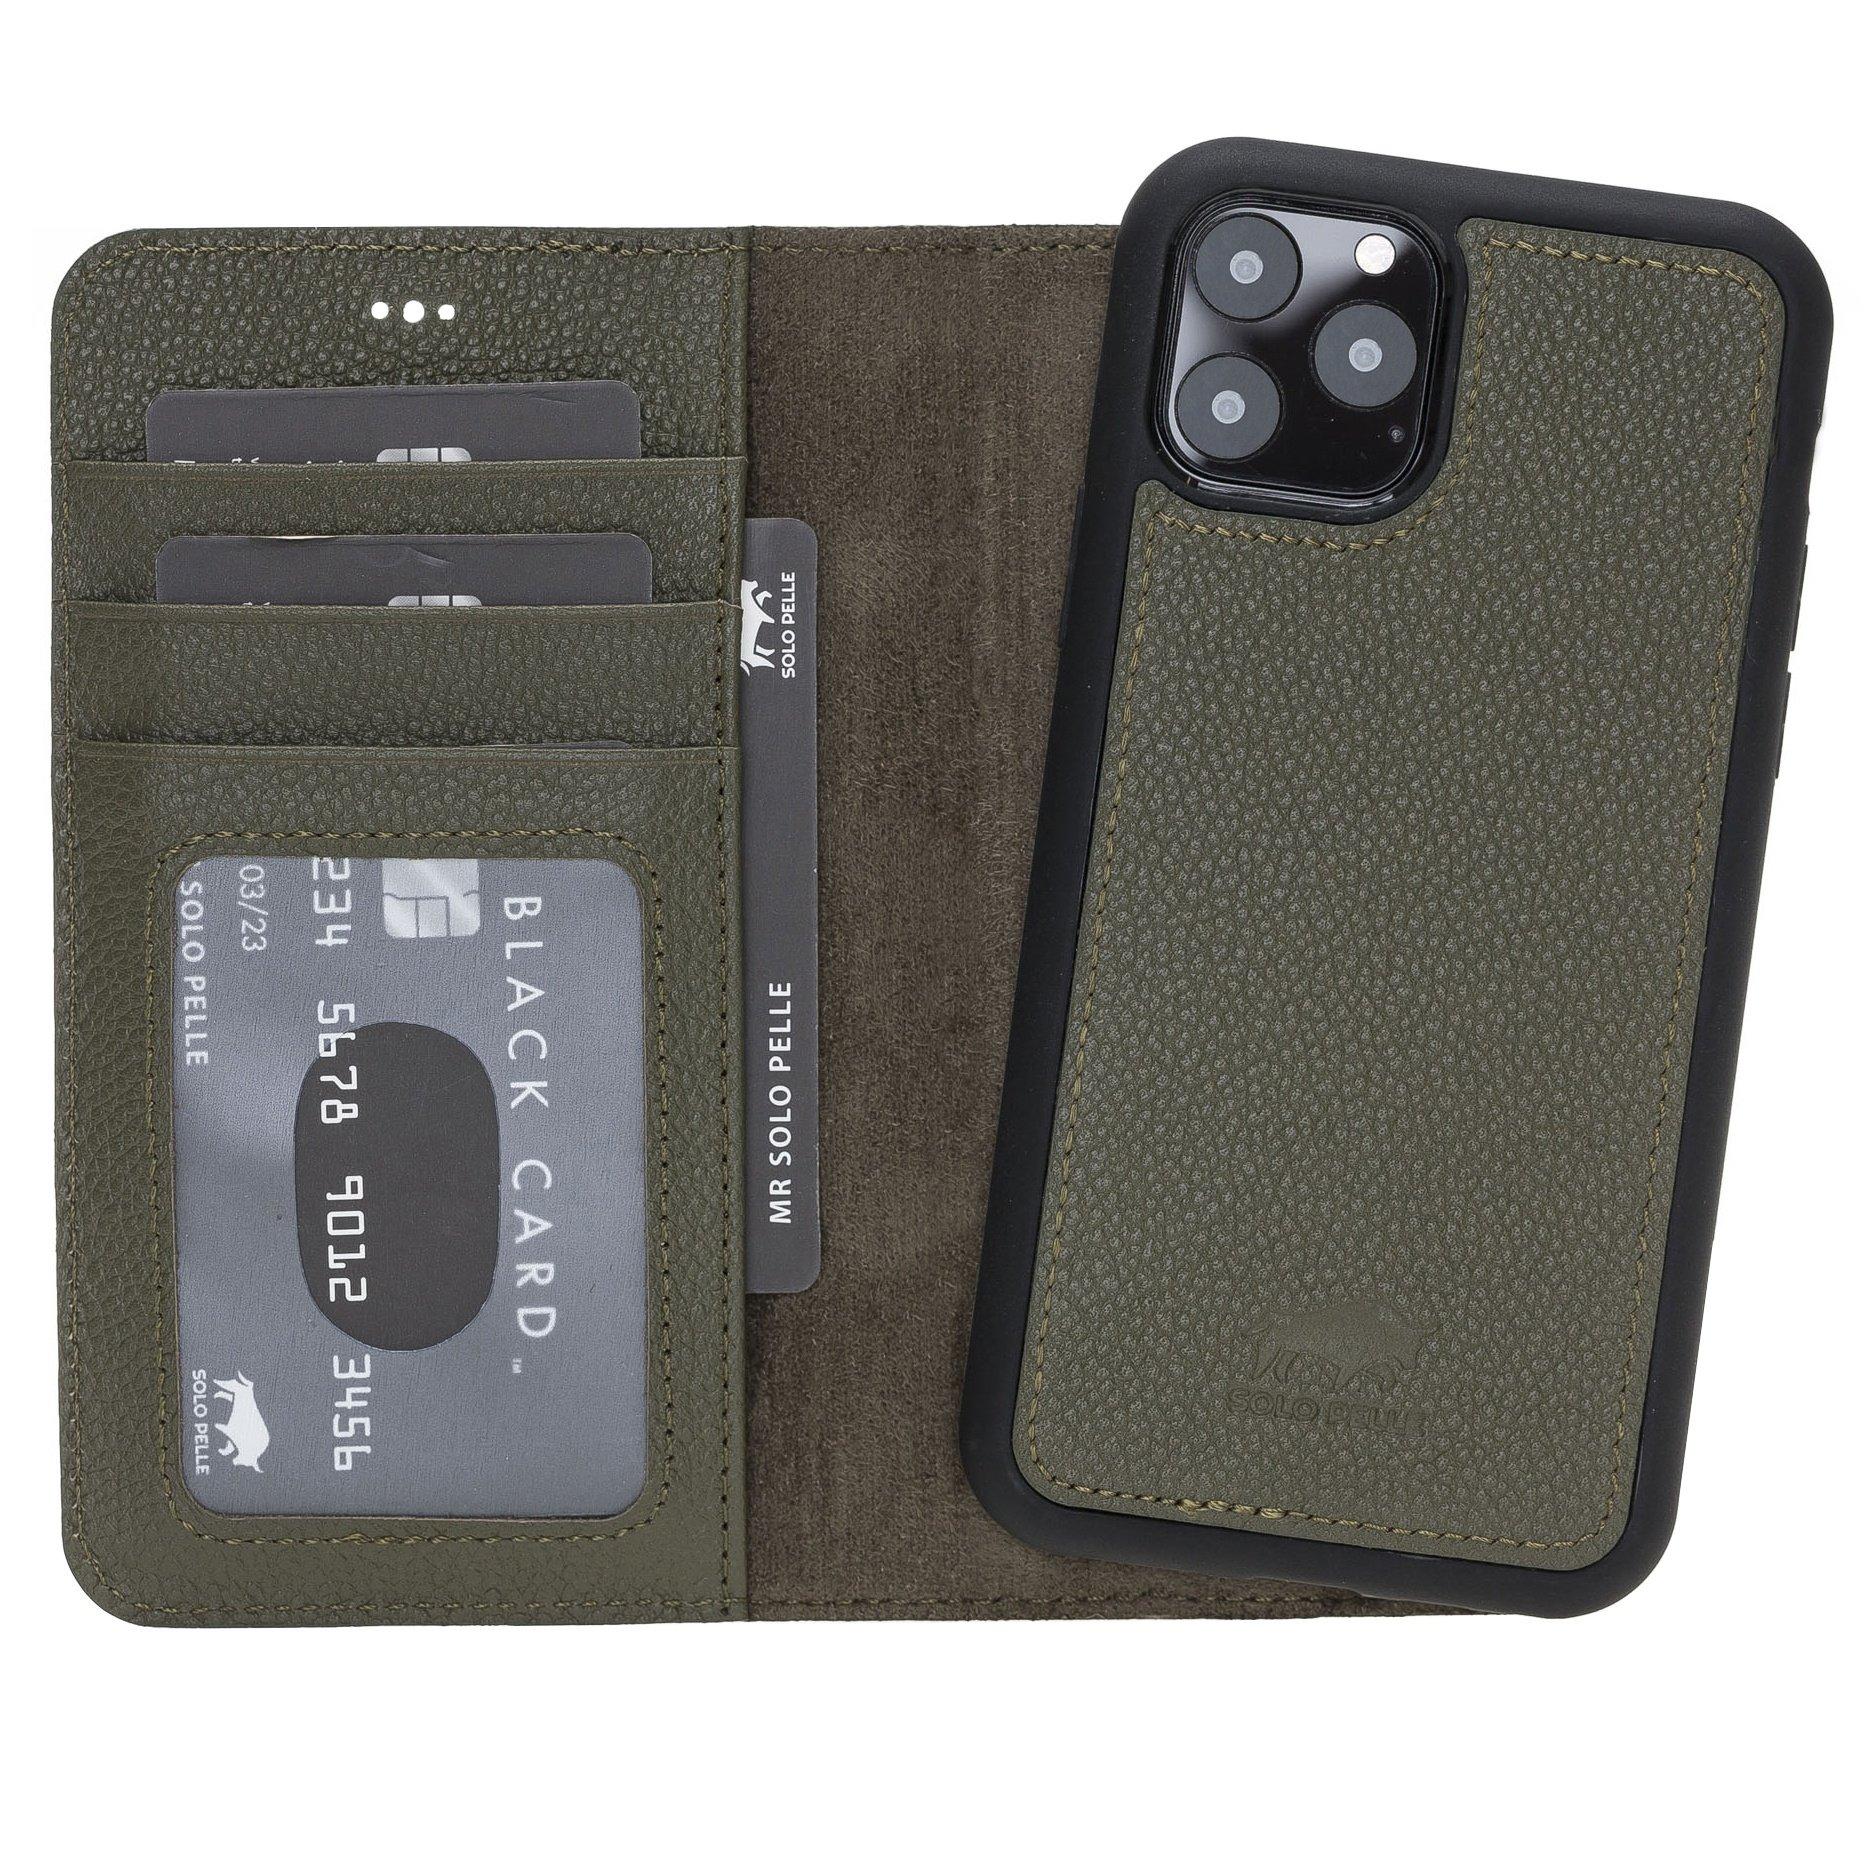 Solo Pelle Lederhülle kompatibel für iPhone 11 Pro in 5.8 Zoll abnehmbare Hülle Harvard (2in1) (Nachtgrün)